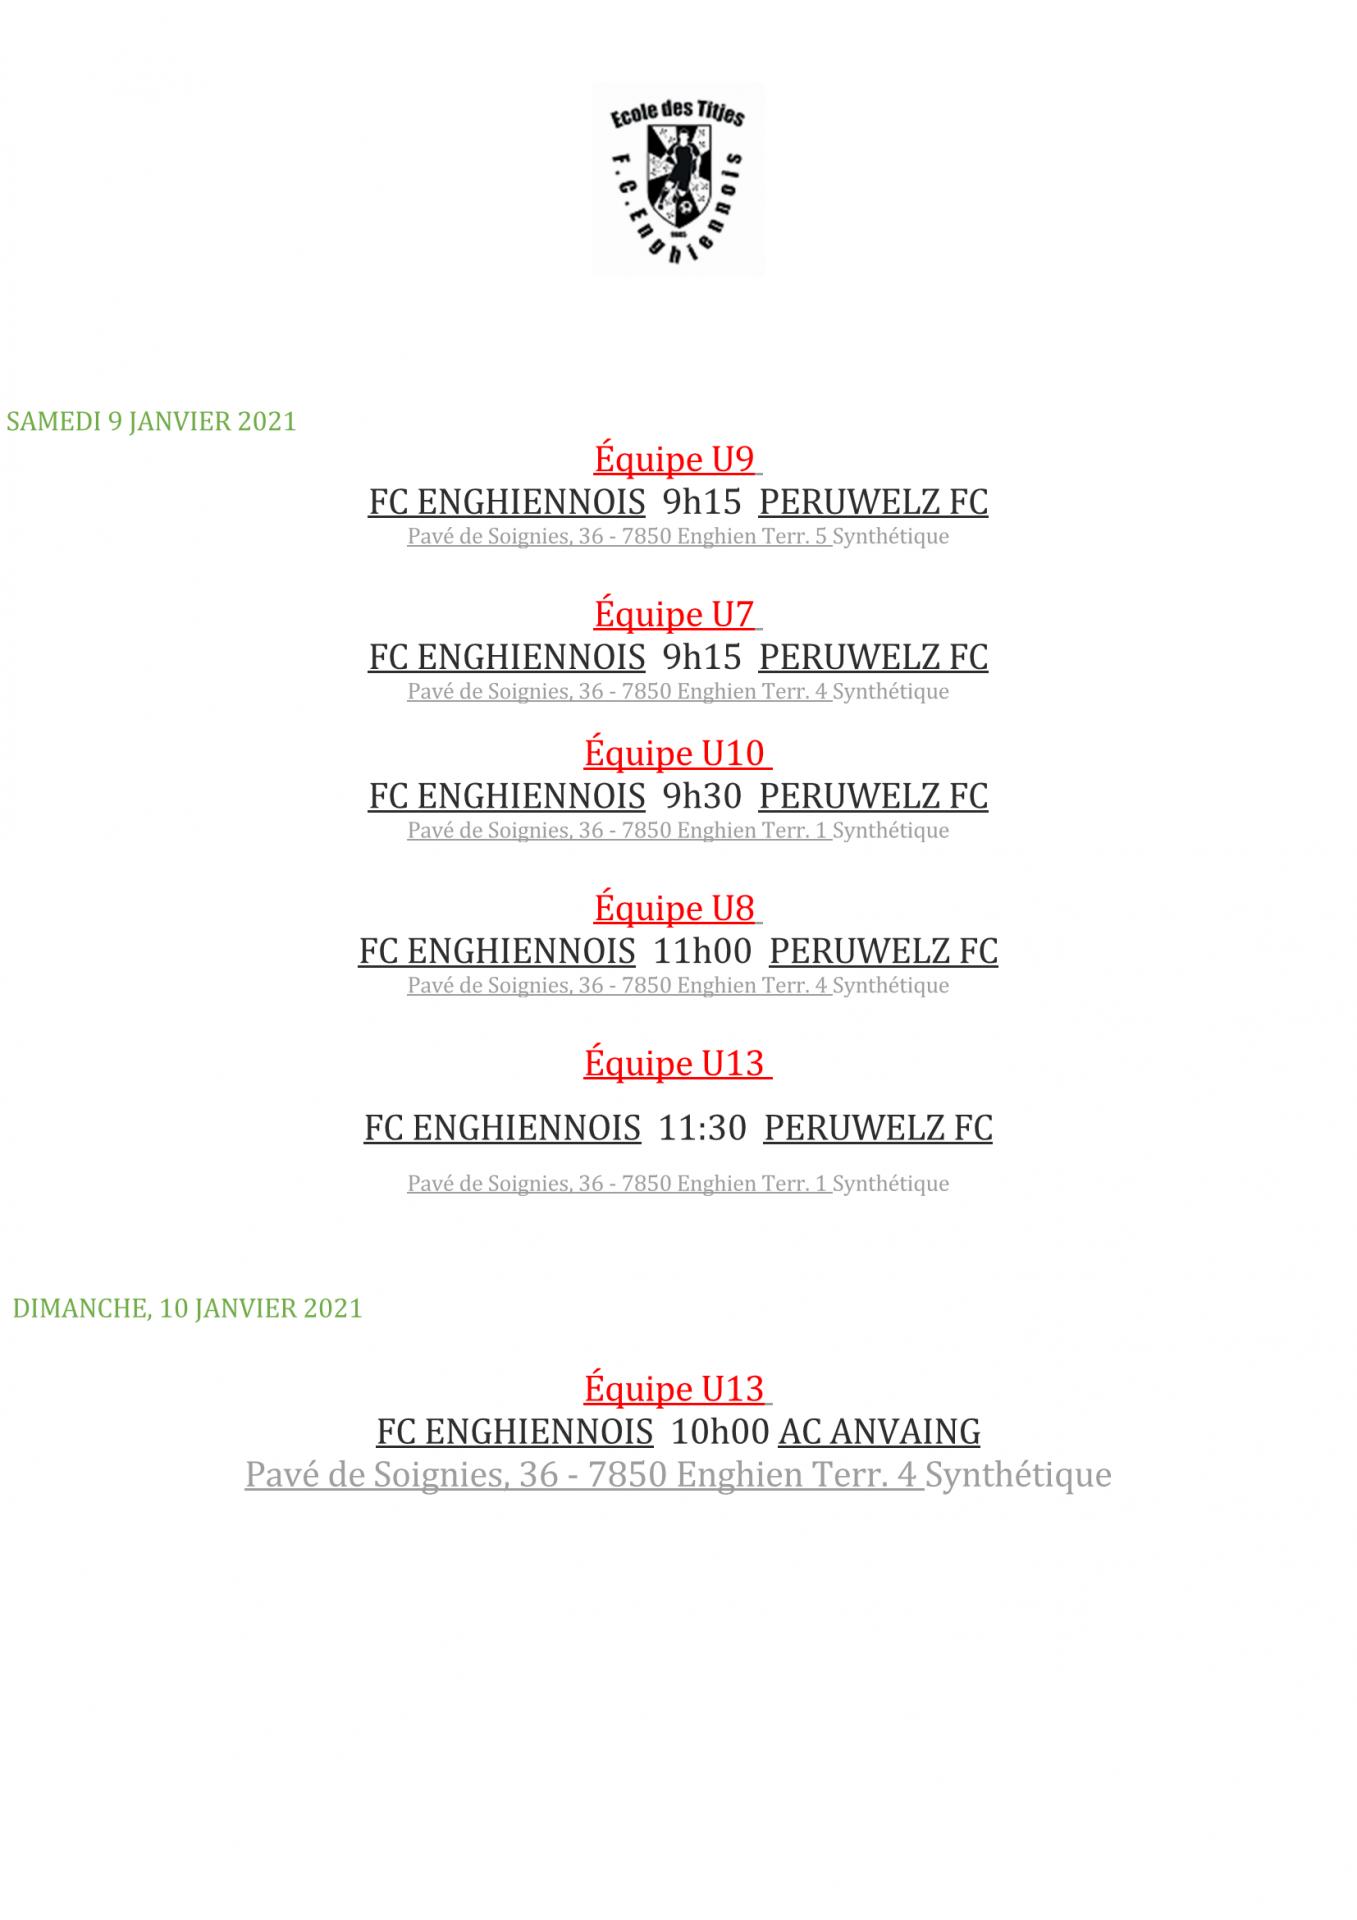 Samedi 9 janvier 2021 match de preparation page 2